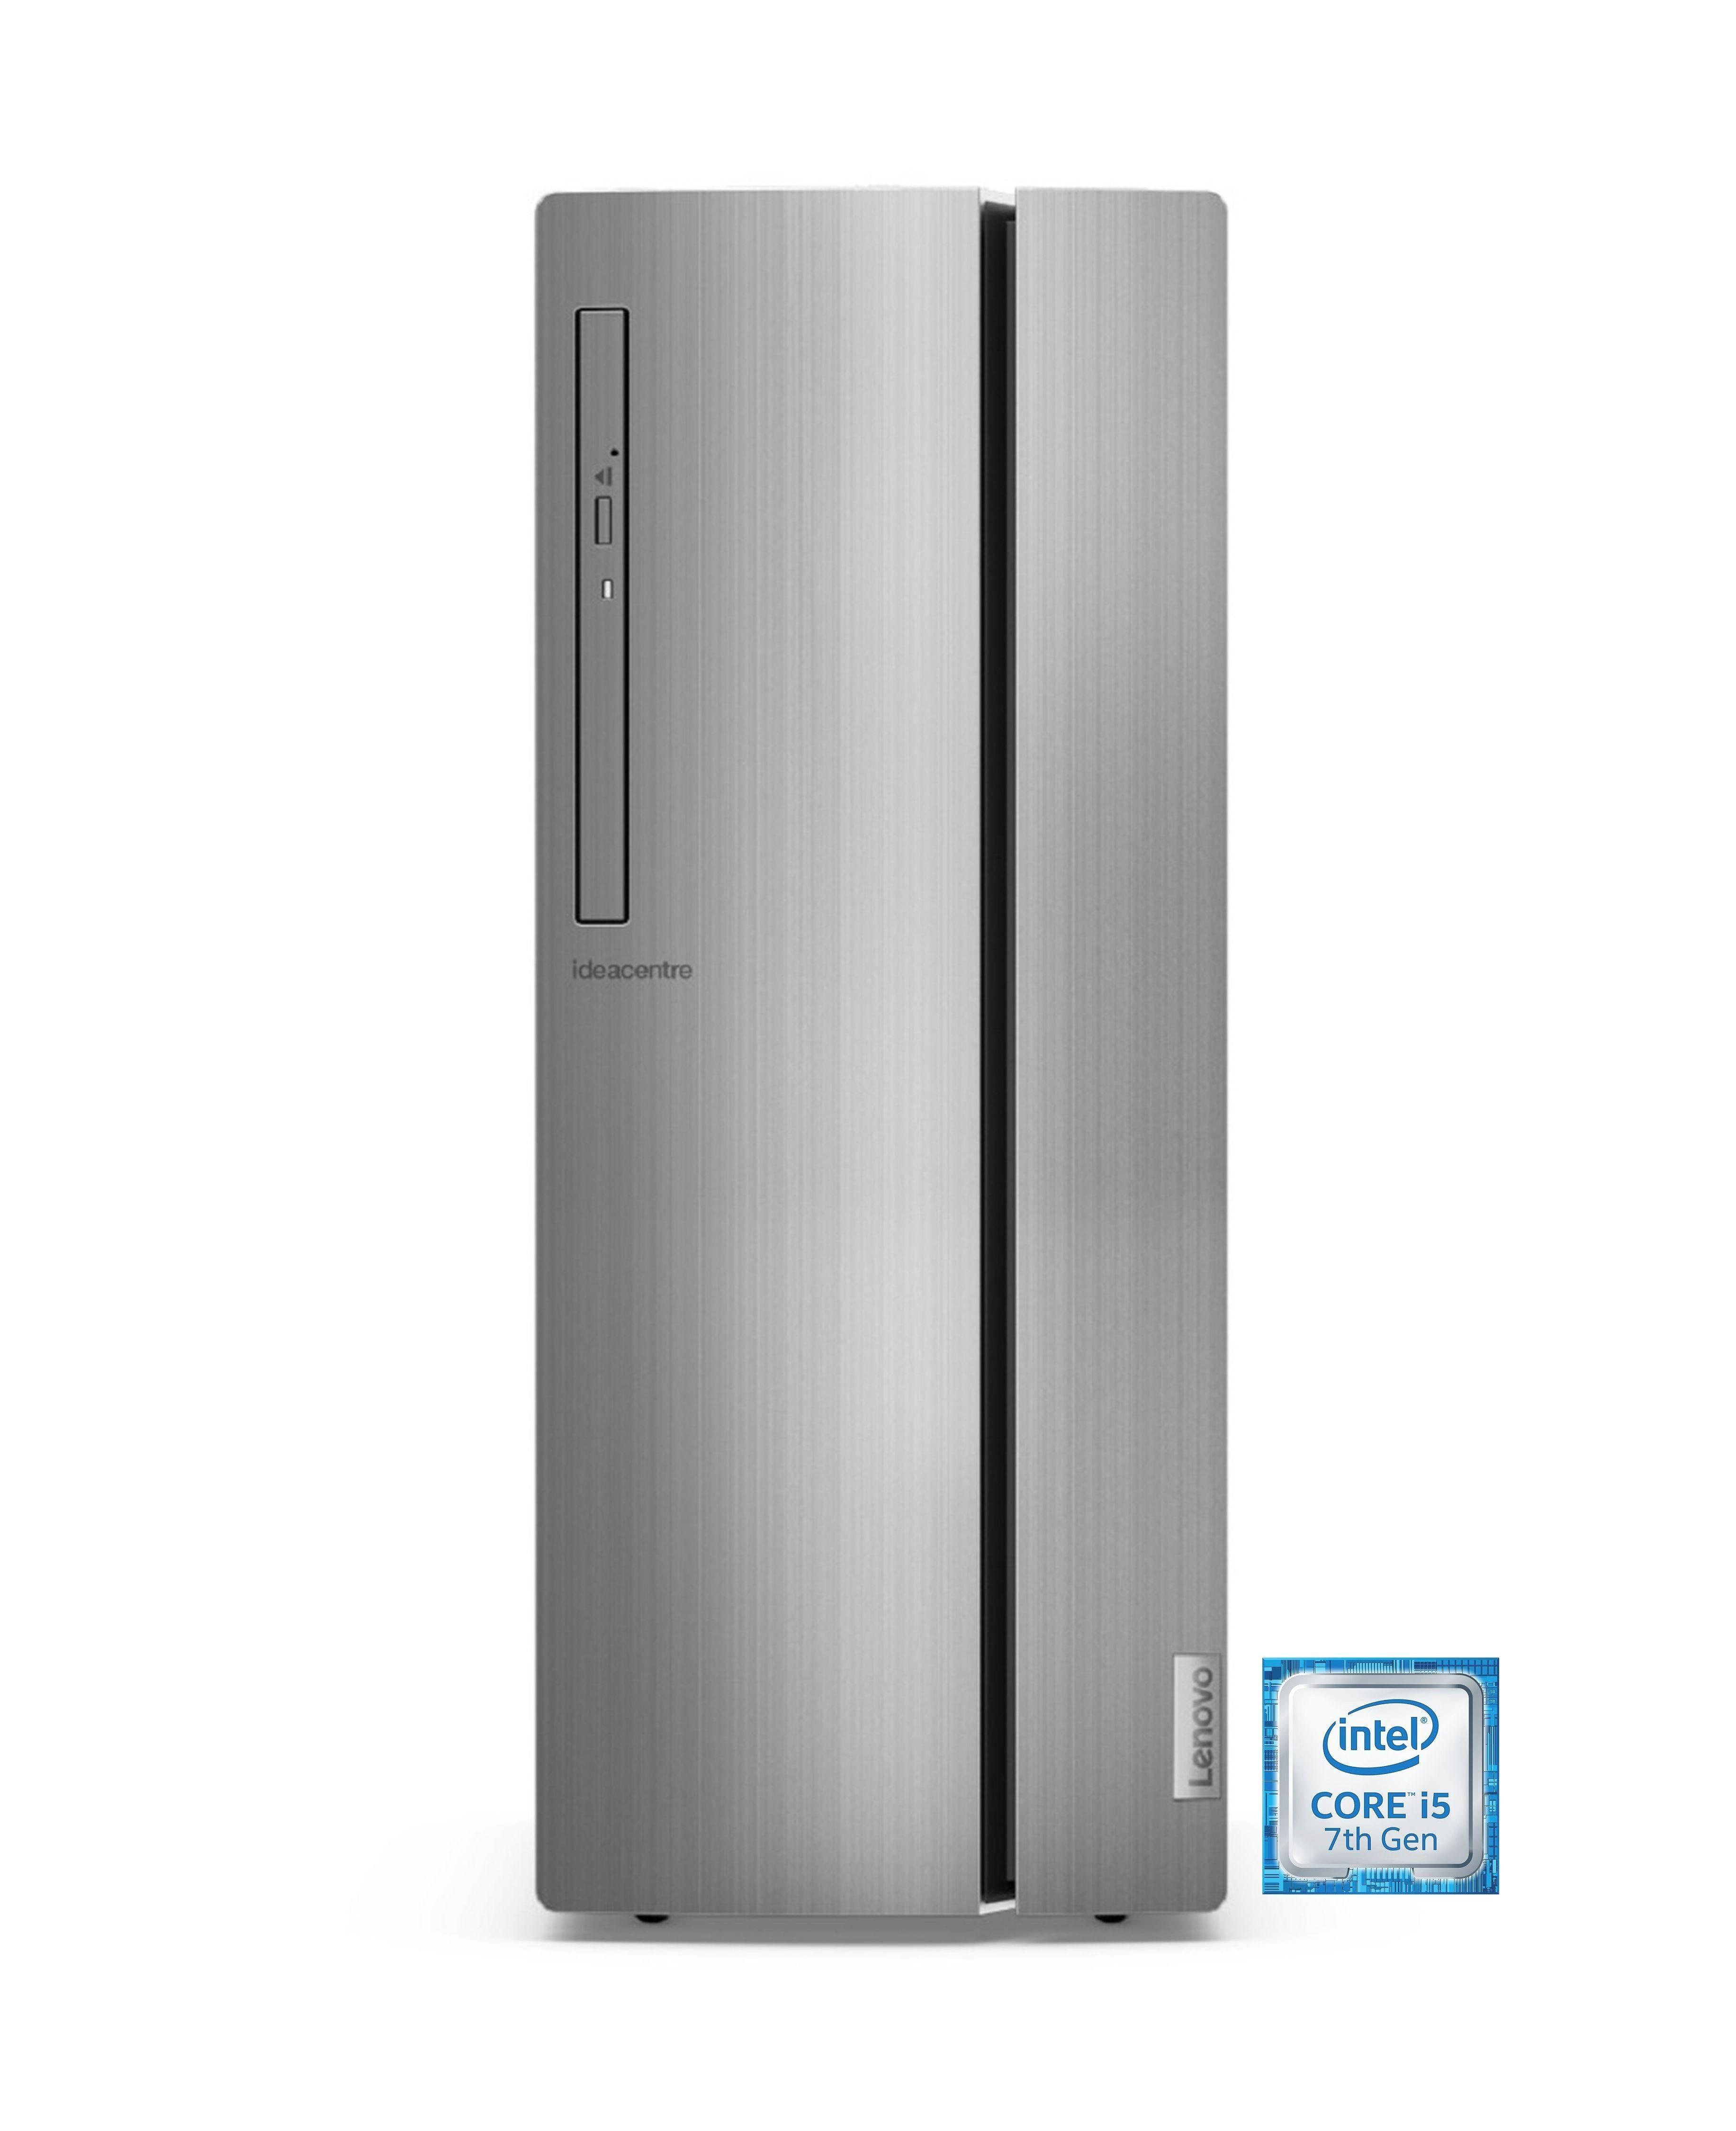 LENOVO Ideacentre 510-15IKL »Intel Core i5, GTX 1050, 128GB SDD + 1 TB HDD, 8GB«